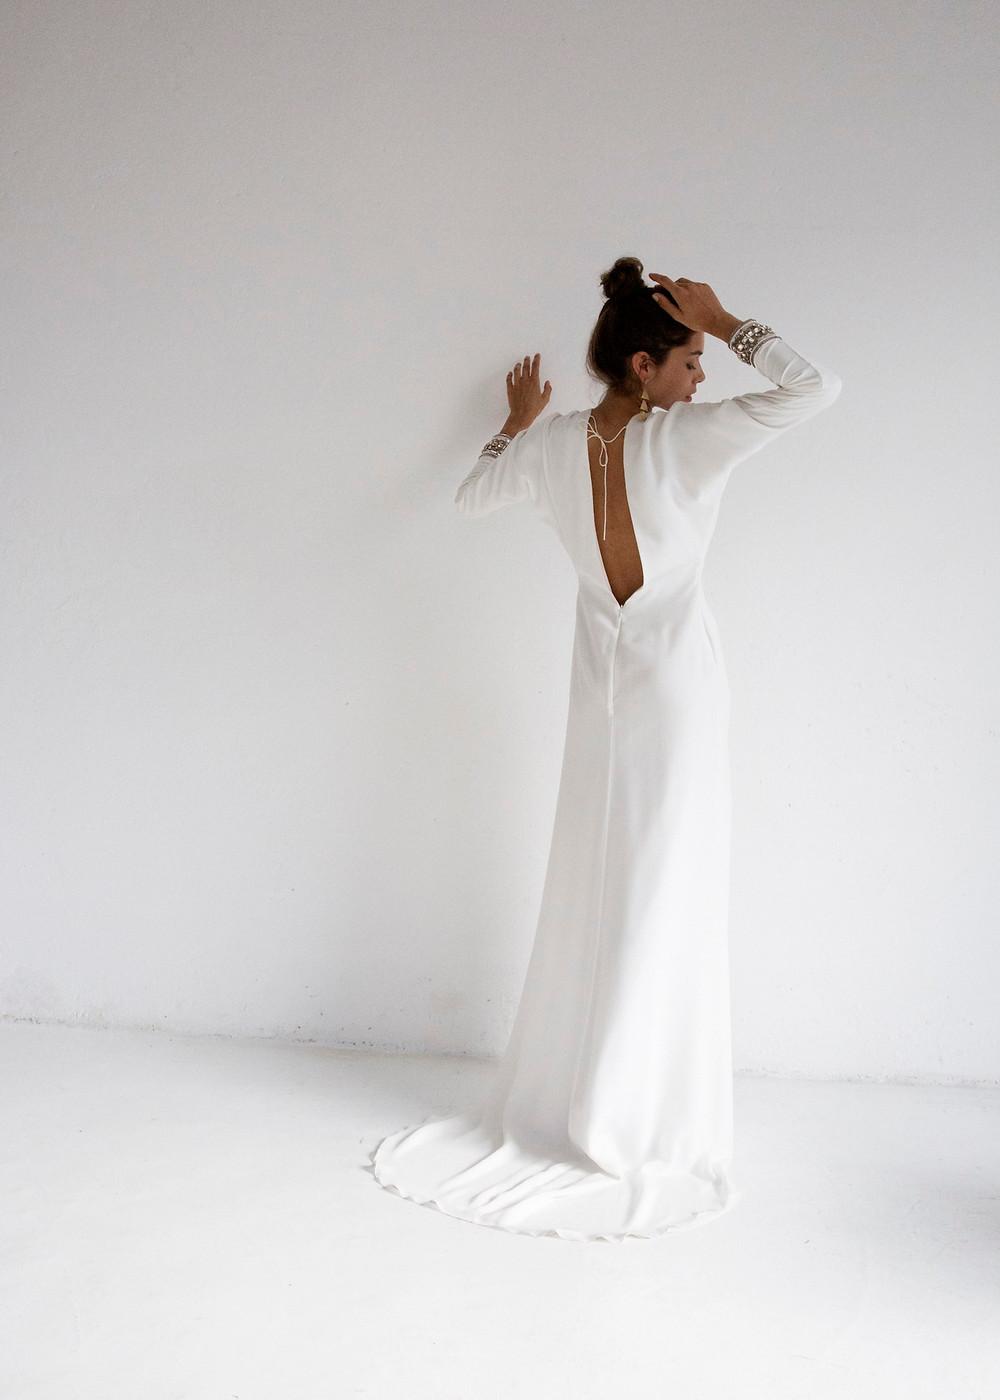 Boise wedding dresses, Élsca Bride, Bridal Shop Boise, Boise Weddings